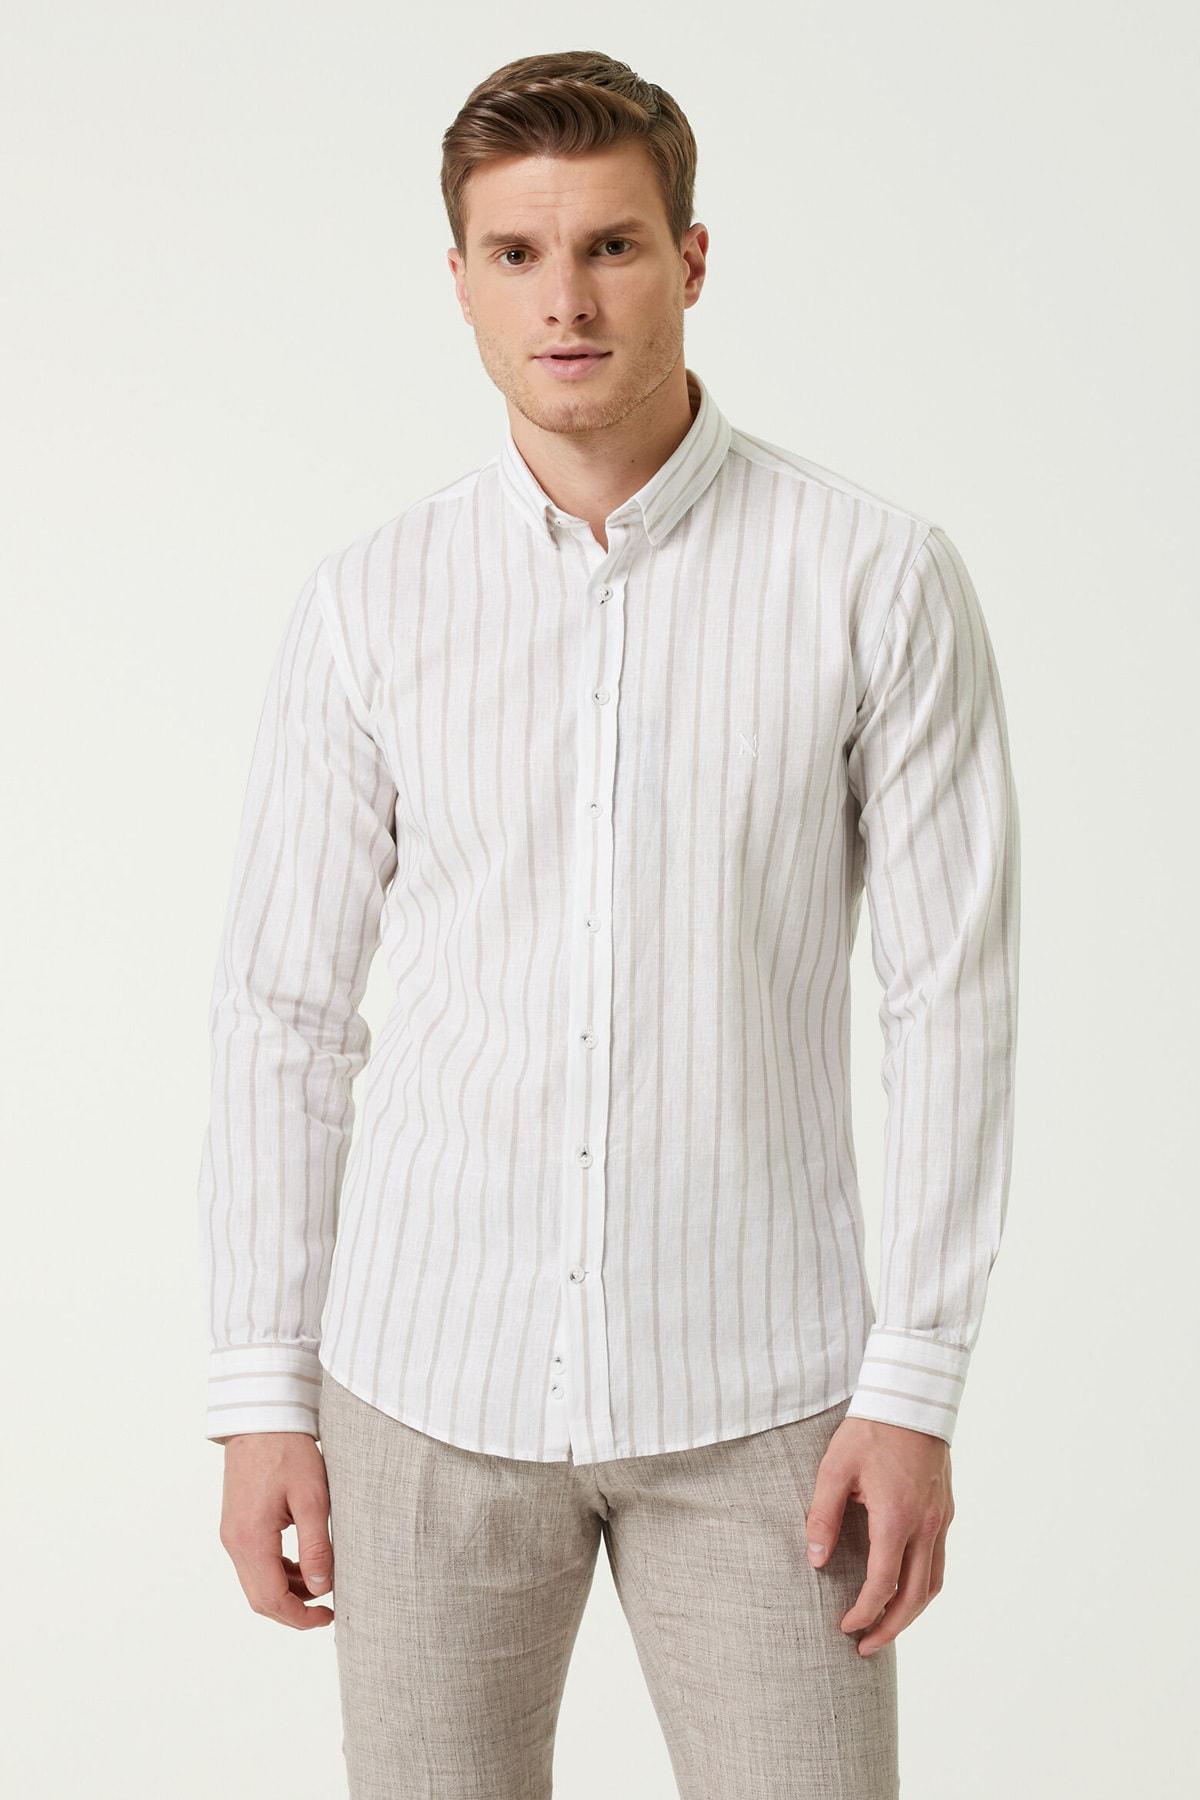 Erkek Slim Fit Beyaz Çzigili Gömlek 1079746